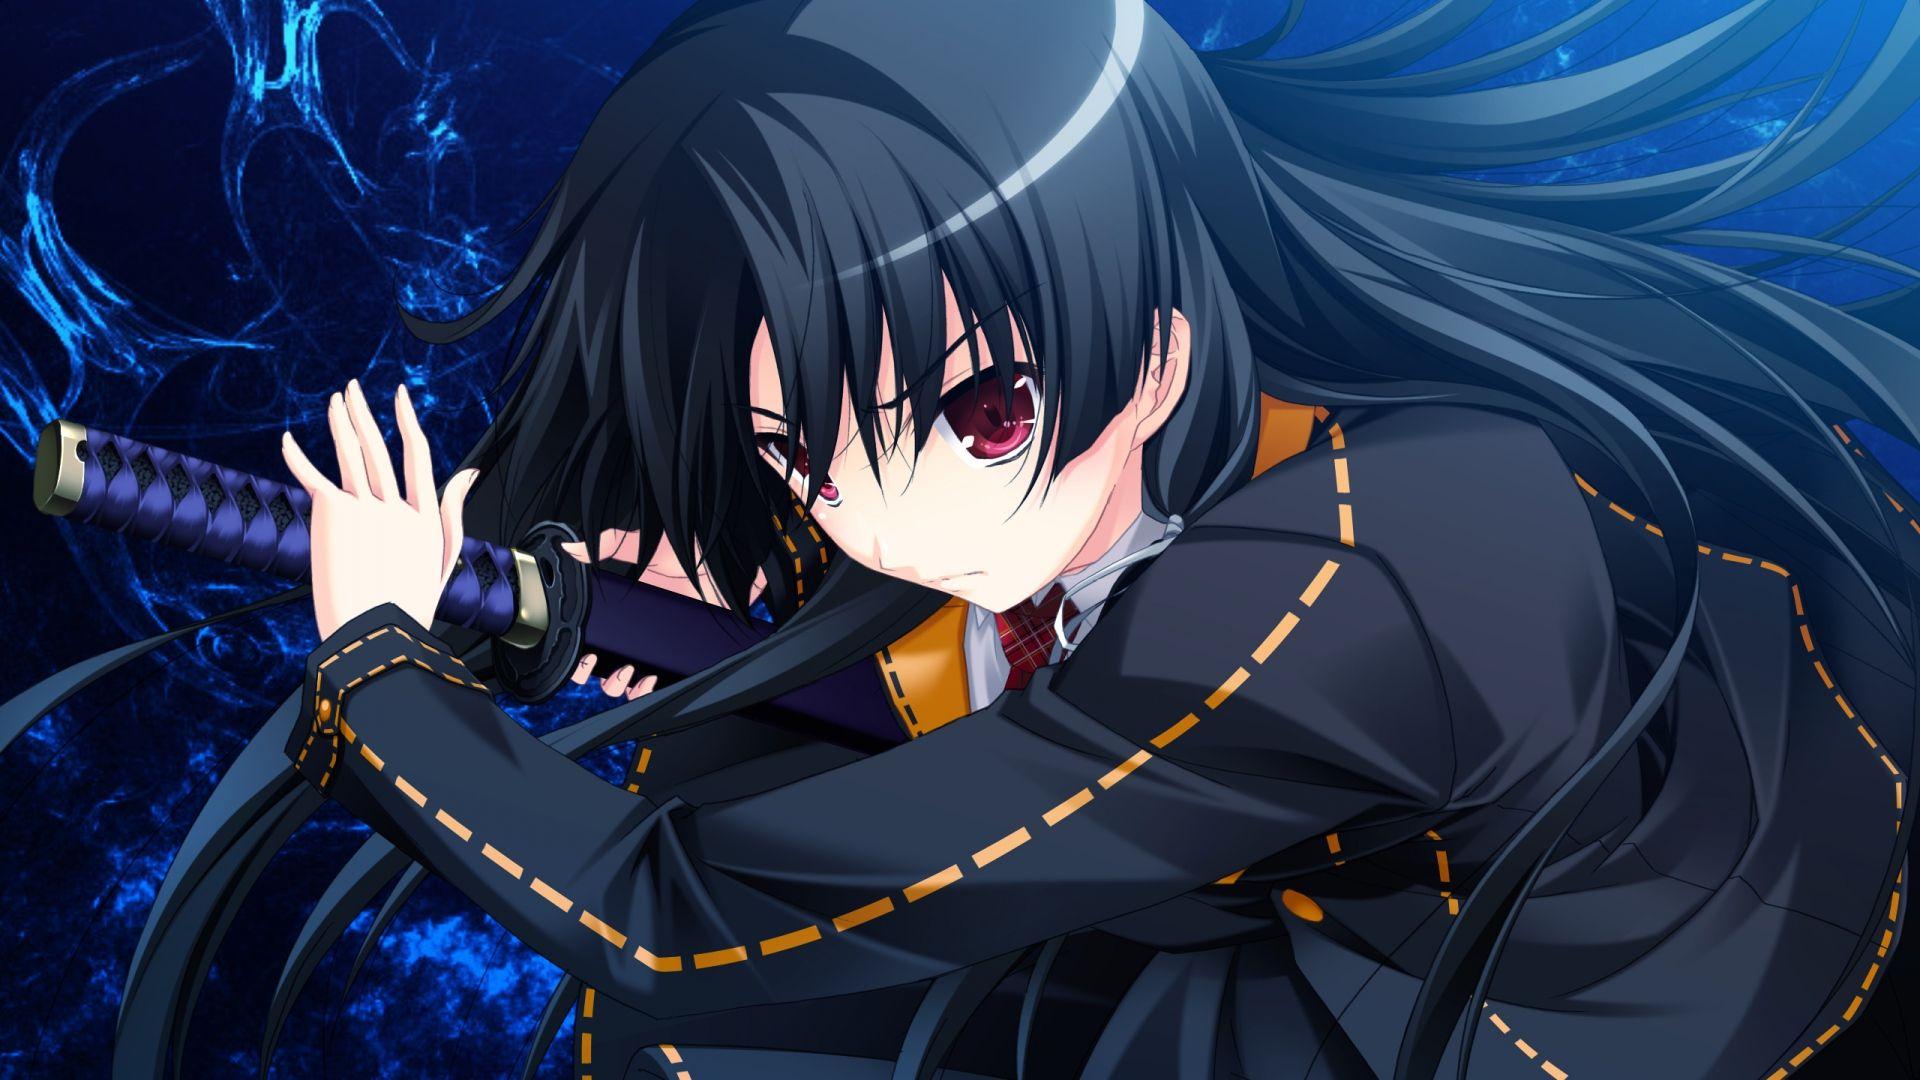 Hd Anime wallpaper download